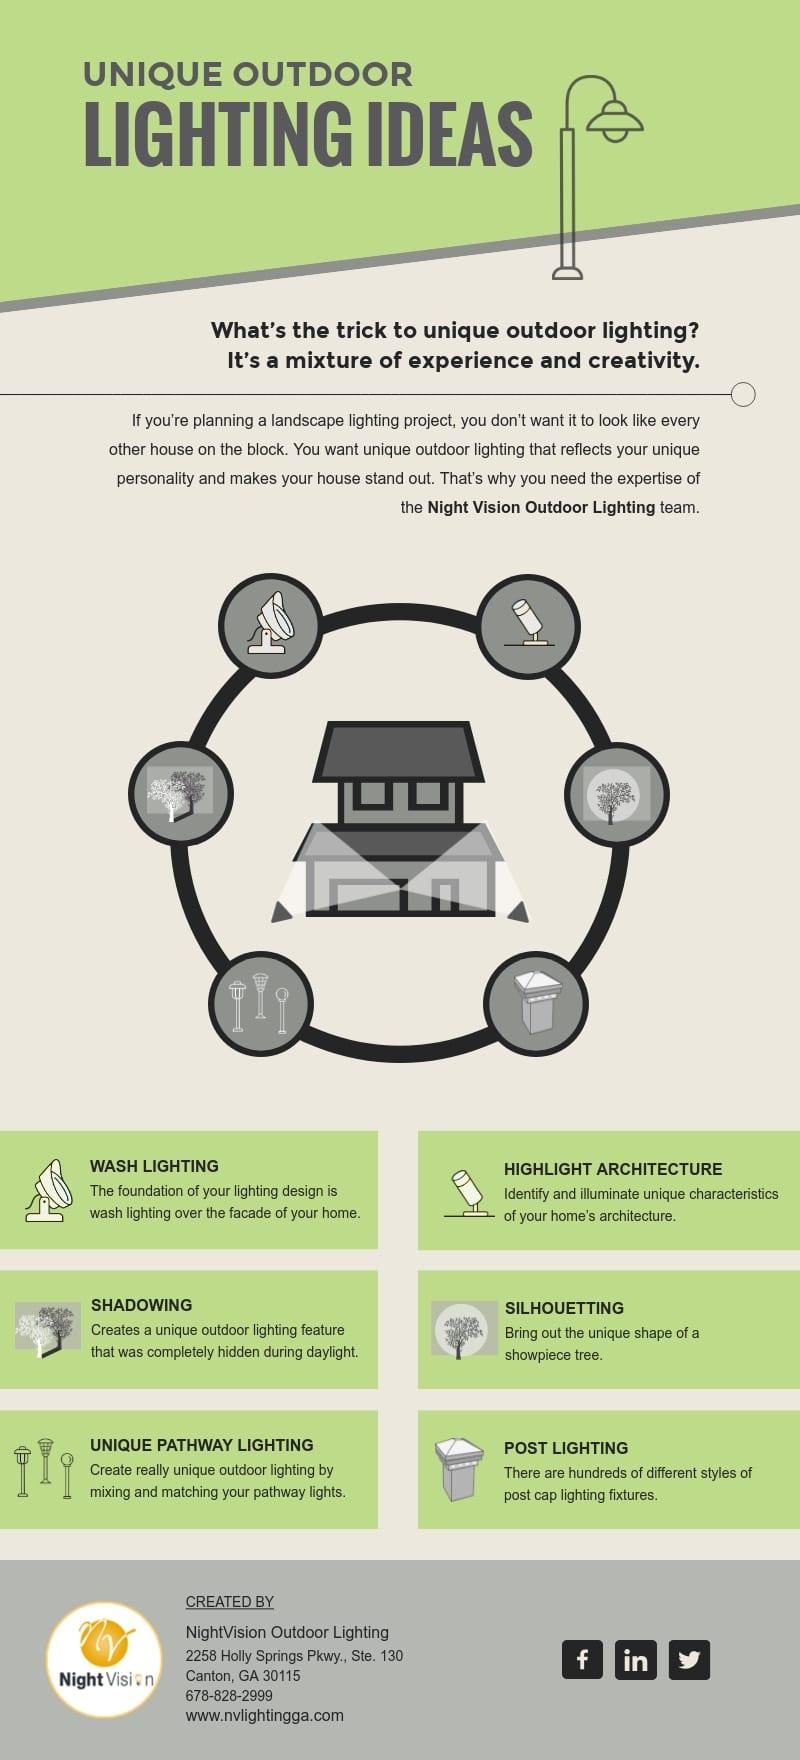 Unique Outdoor Lighting Ideas [infographic]